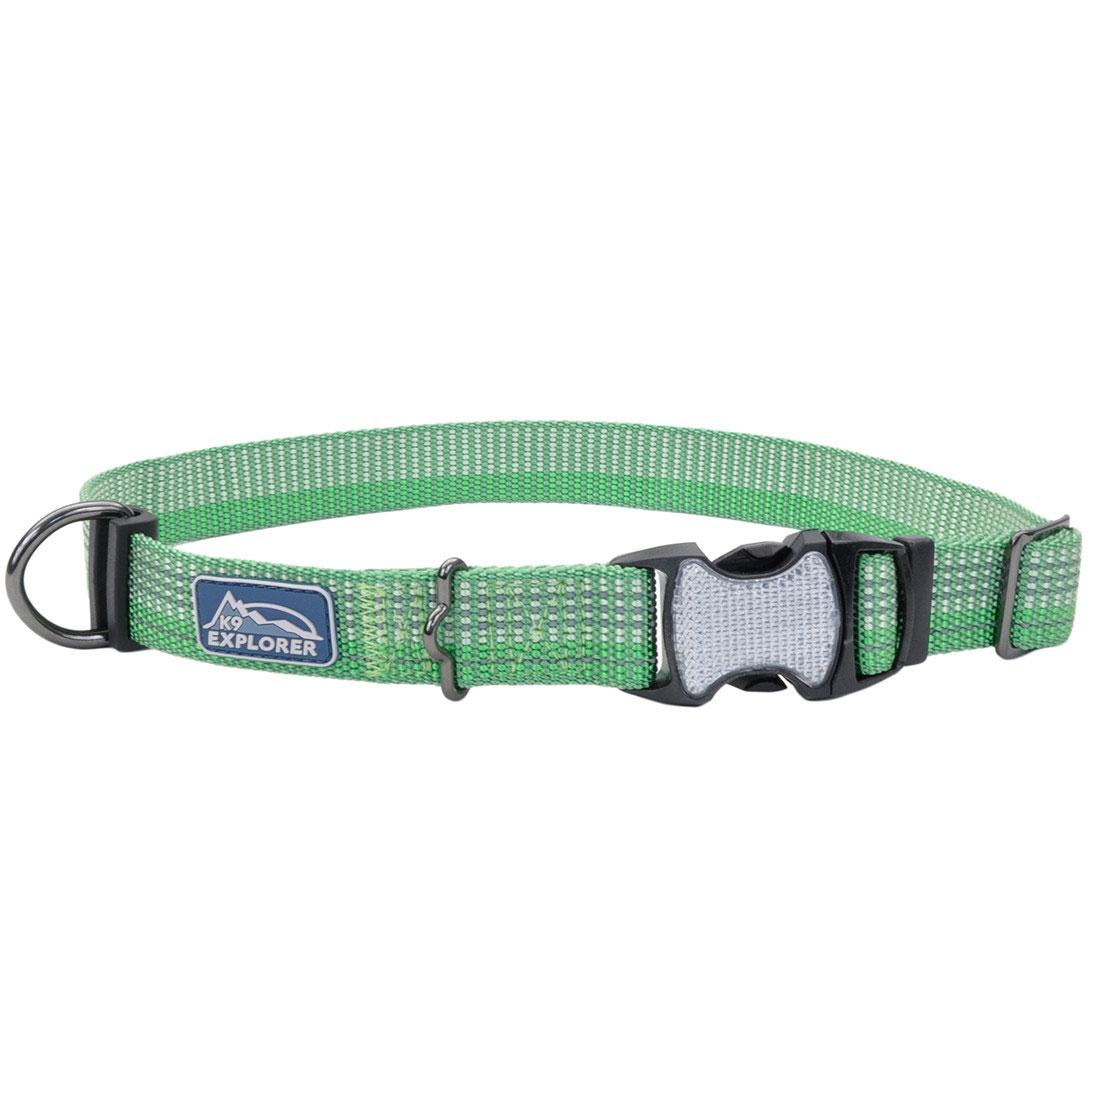 Coastal Pet Products 36933 MDW26